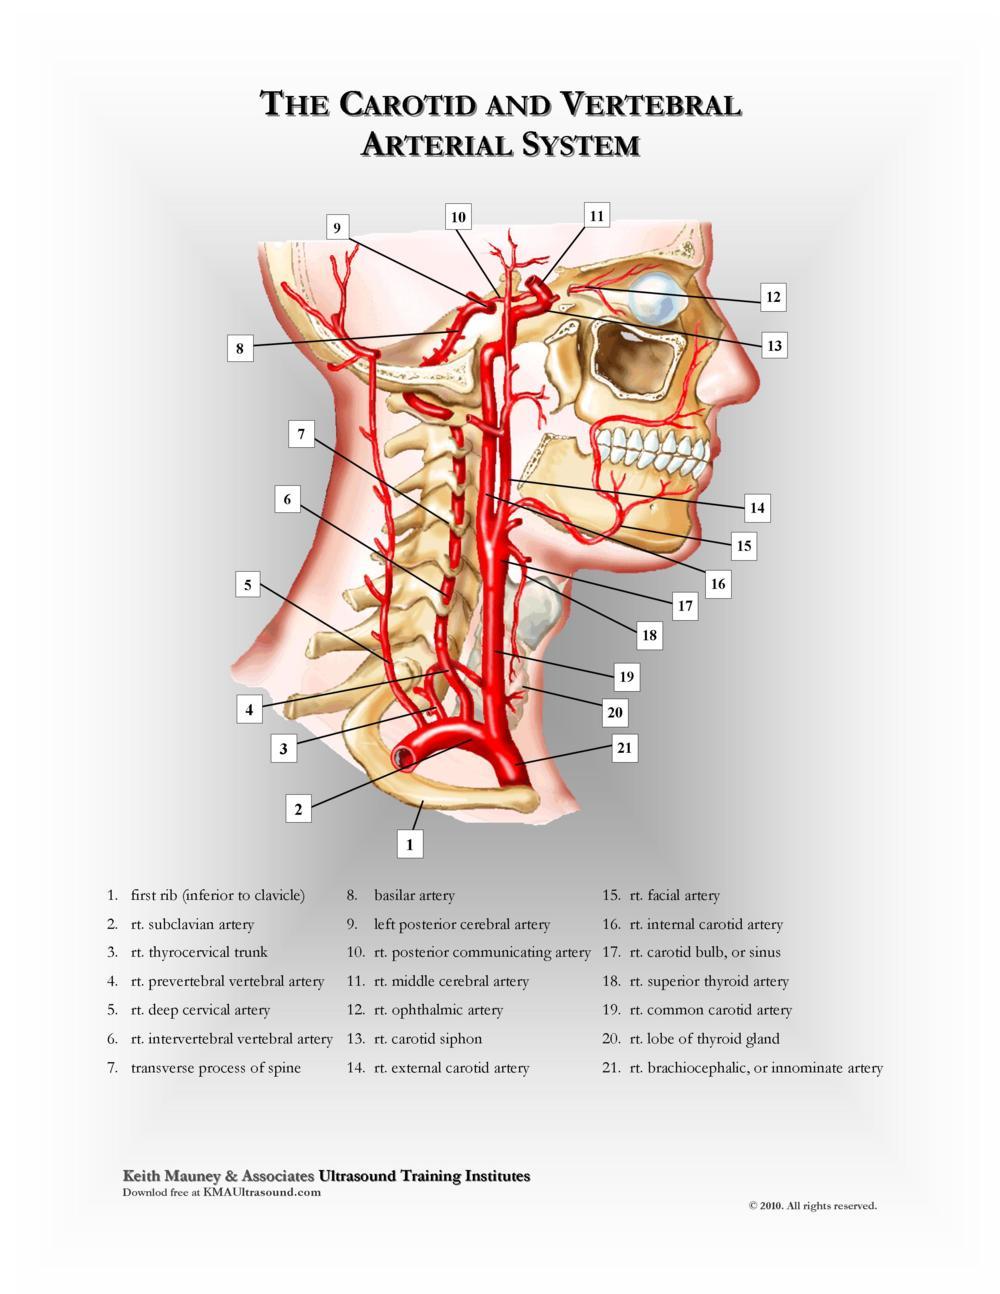 KMA Ultrasound Carotid and Vertebral Arterial System